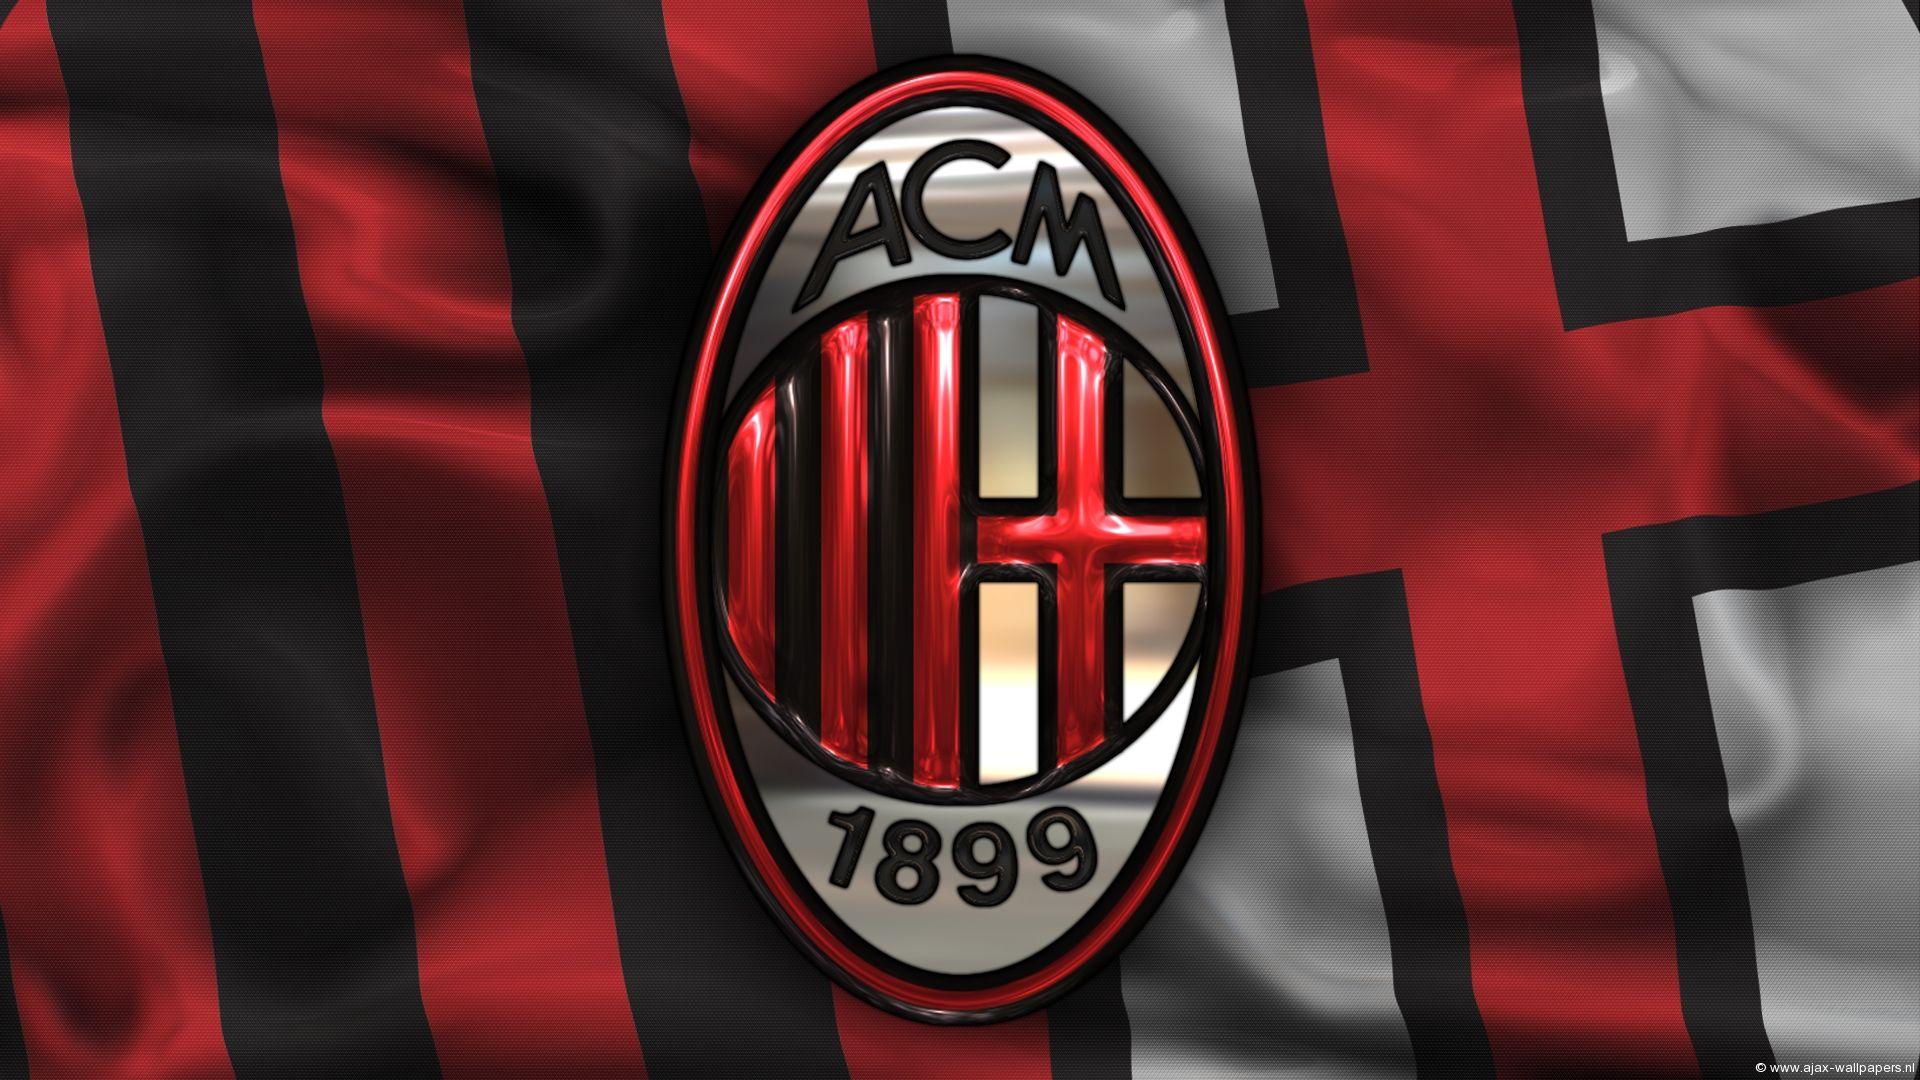 Ac Milan Spot Napoli Ac Milan Official Lineups Bola Futebol